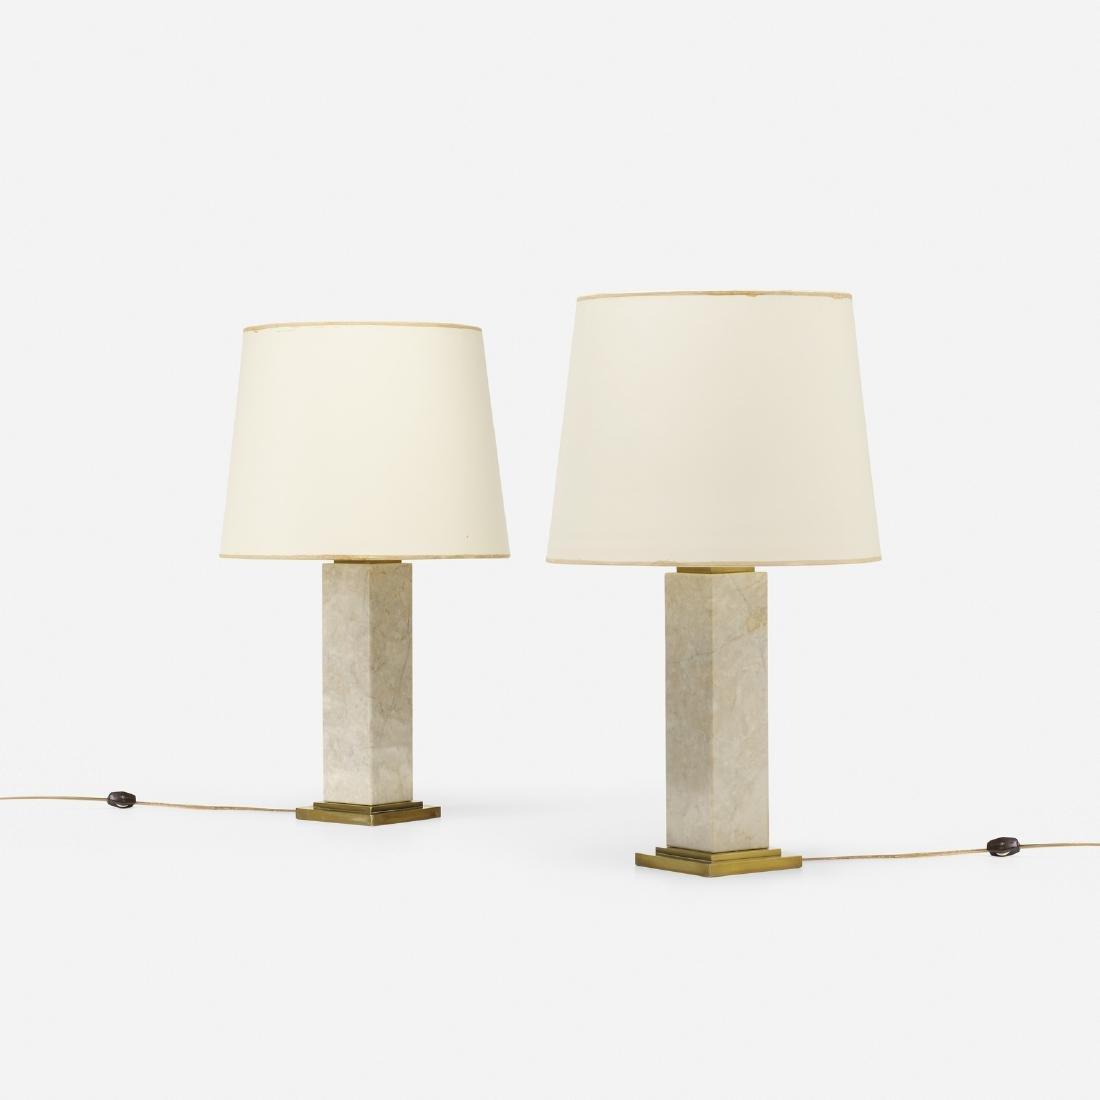 T.H. Robsjohn-Gibbings, table lamps model no. 303, pair